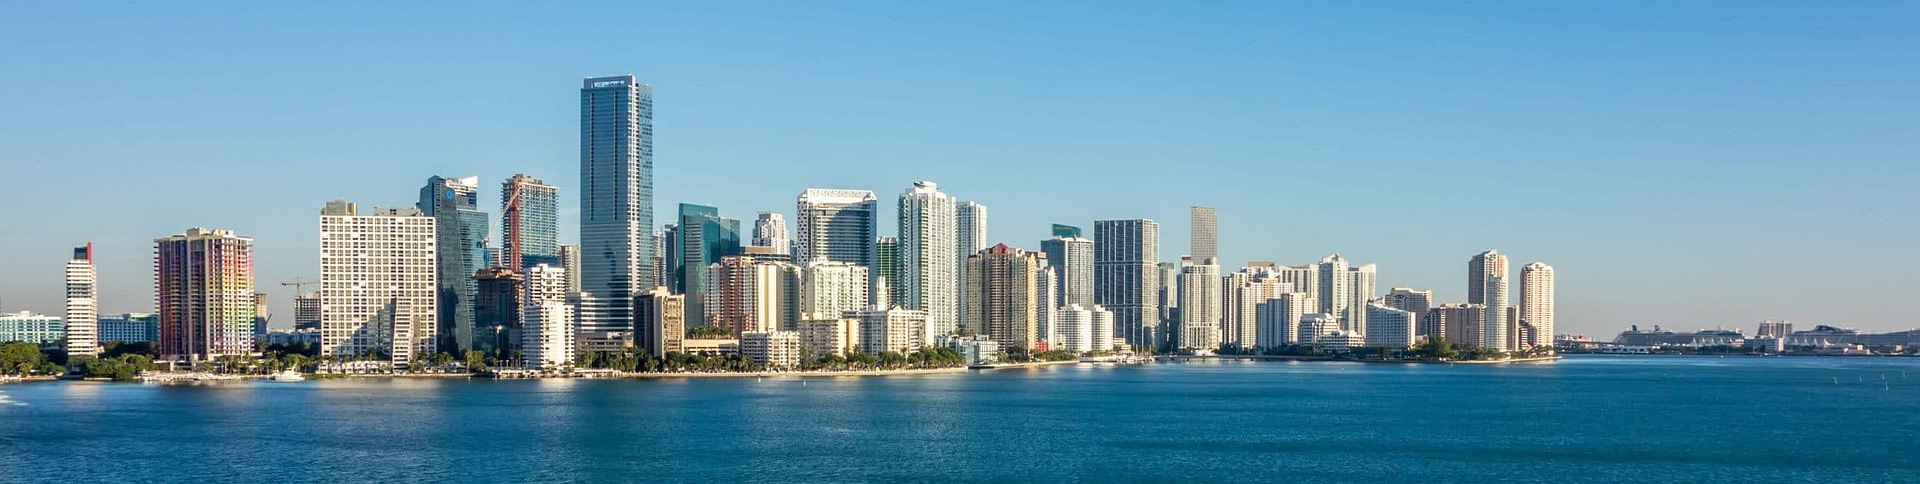 Miami Skin Institute Office